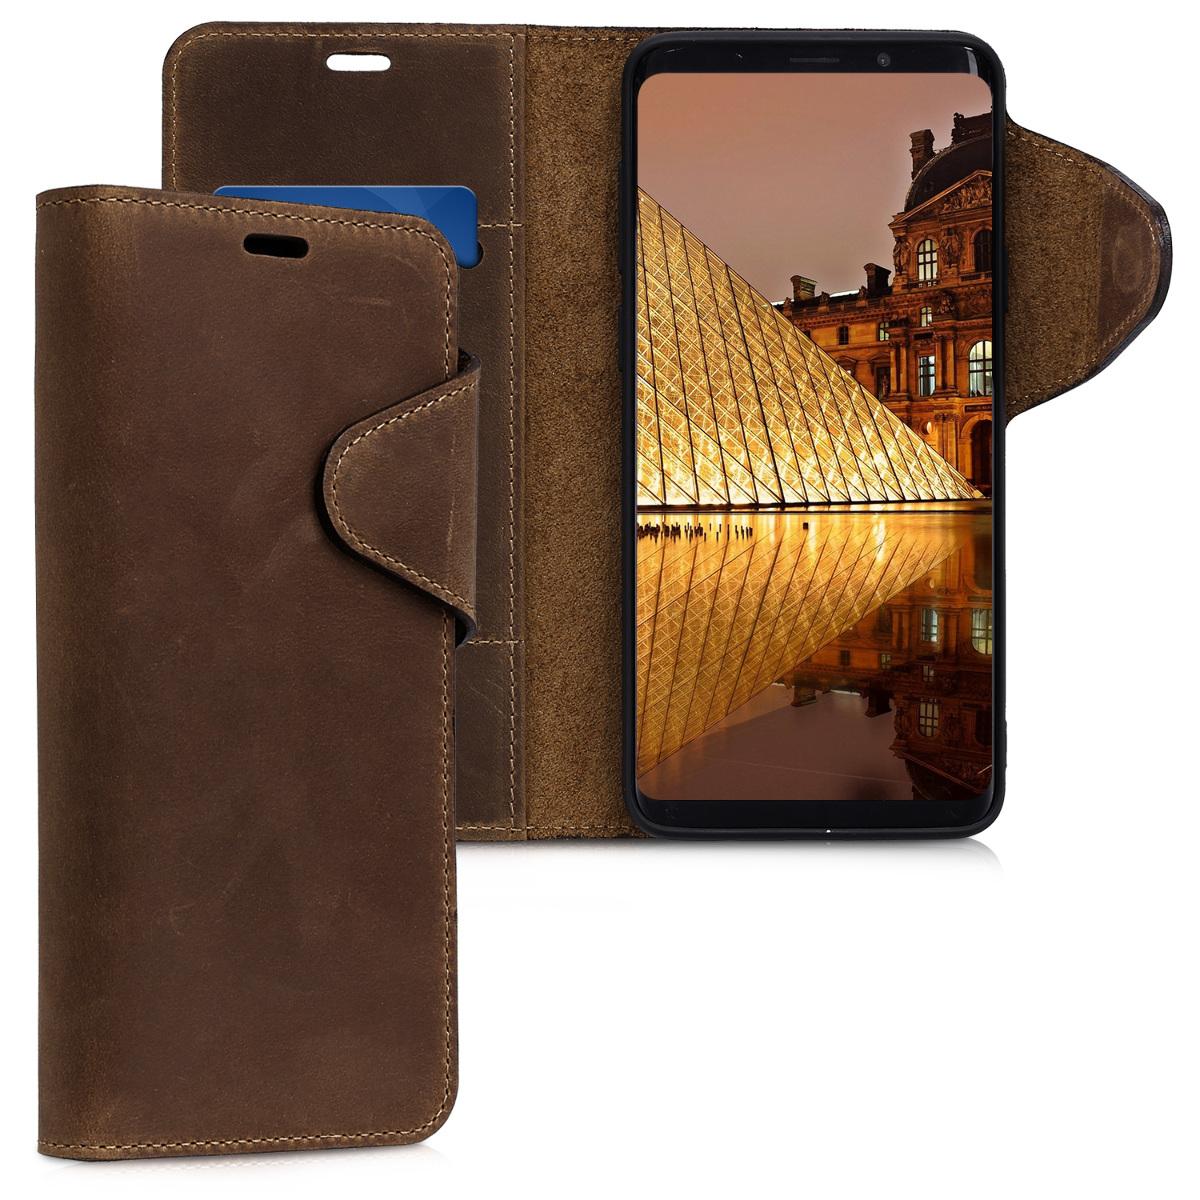 Kalibri Δερμάτινη Suede Θήκη - Πορτοφόλι Samsung Galaxy S9 Plus - Brown (44486.05)